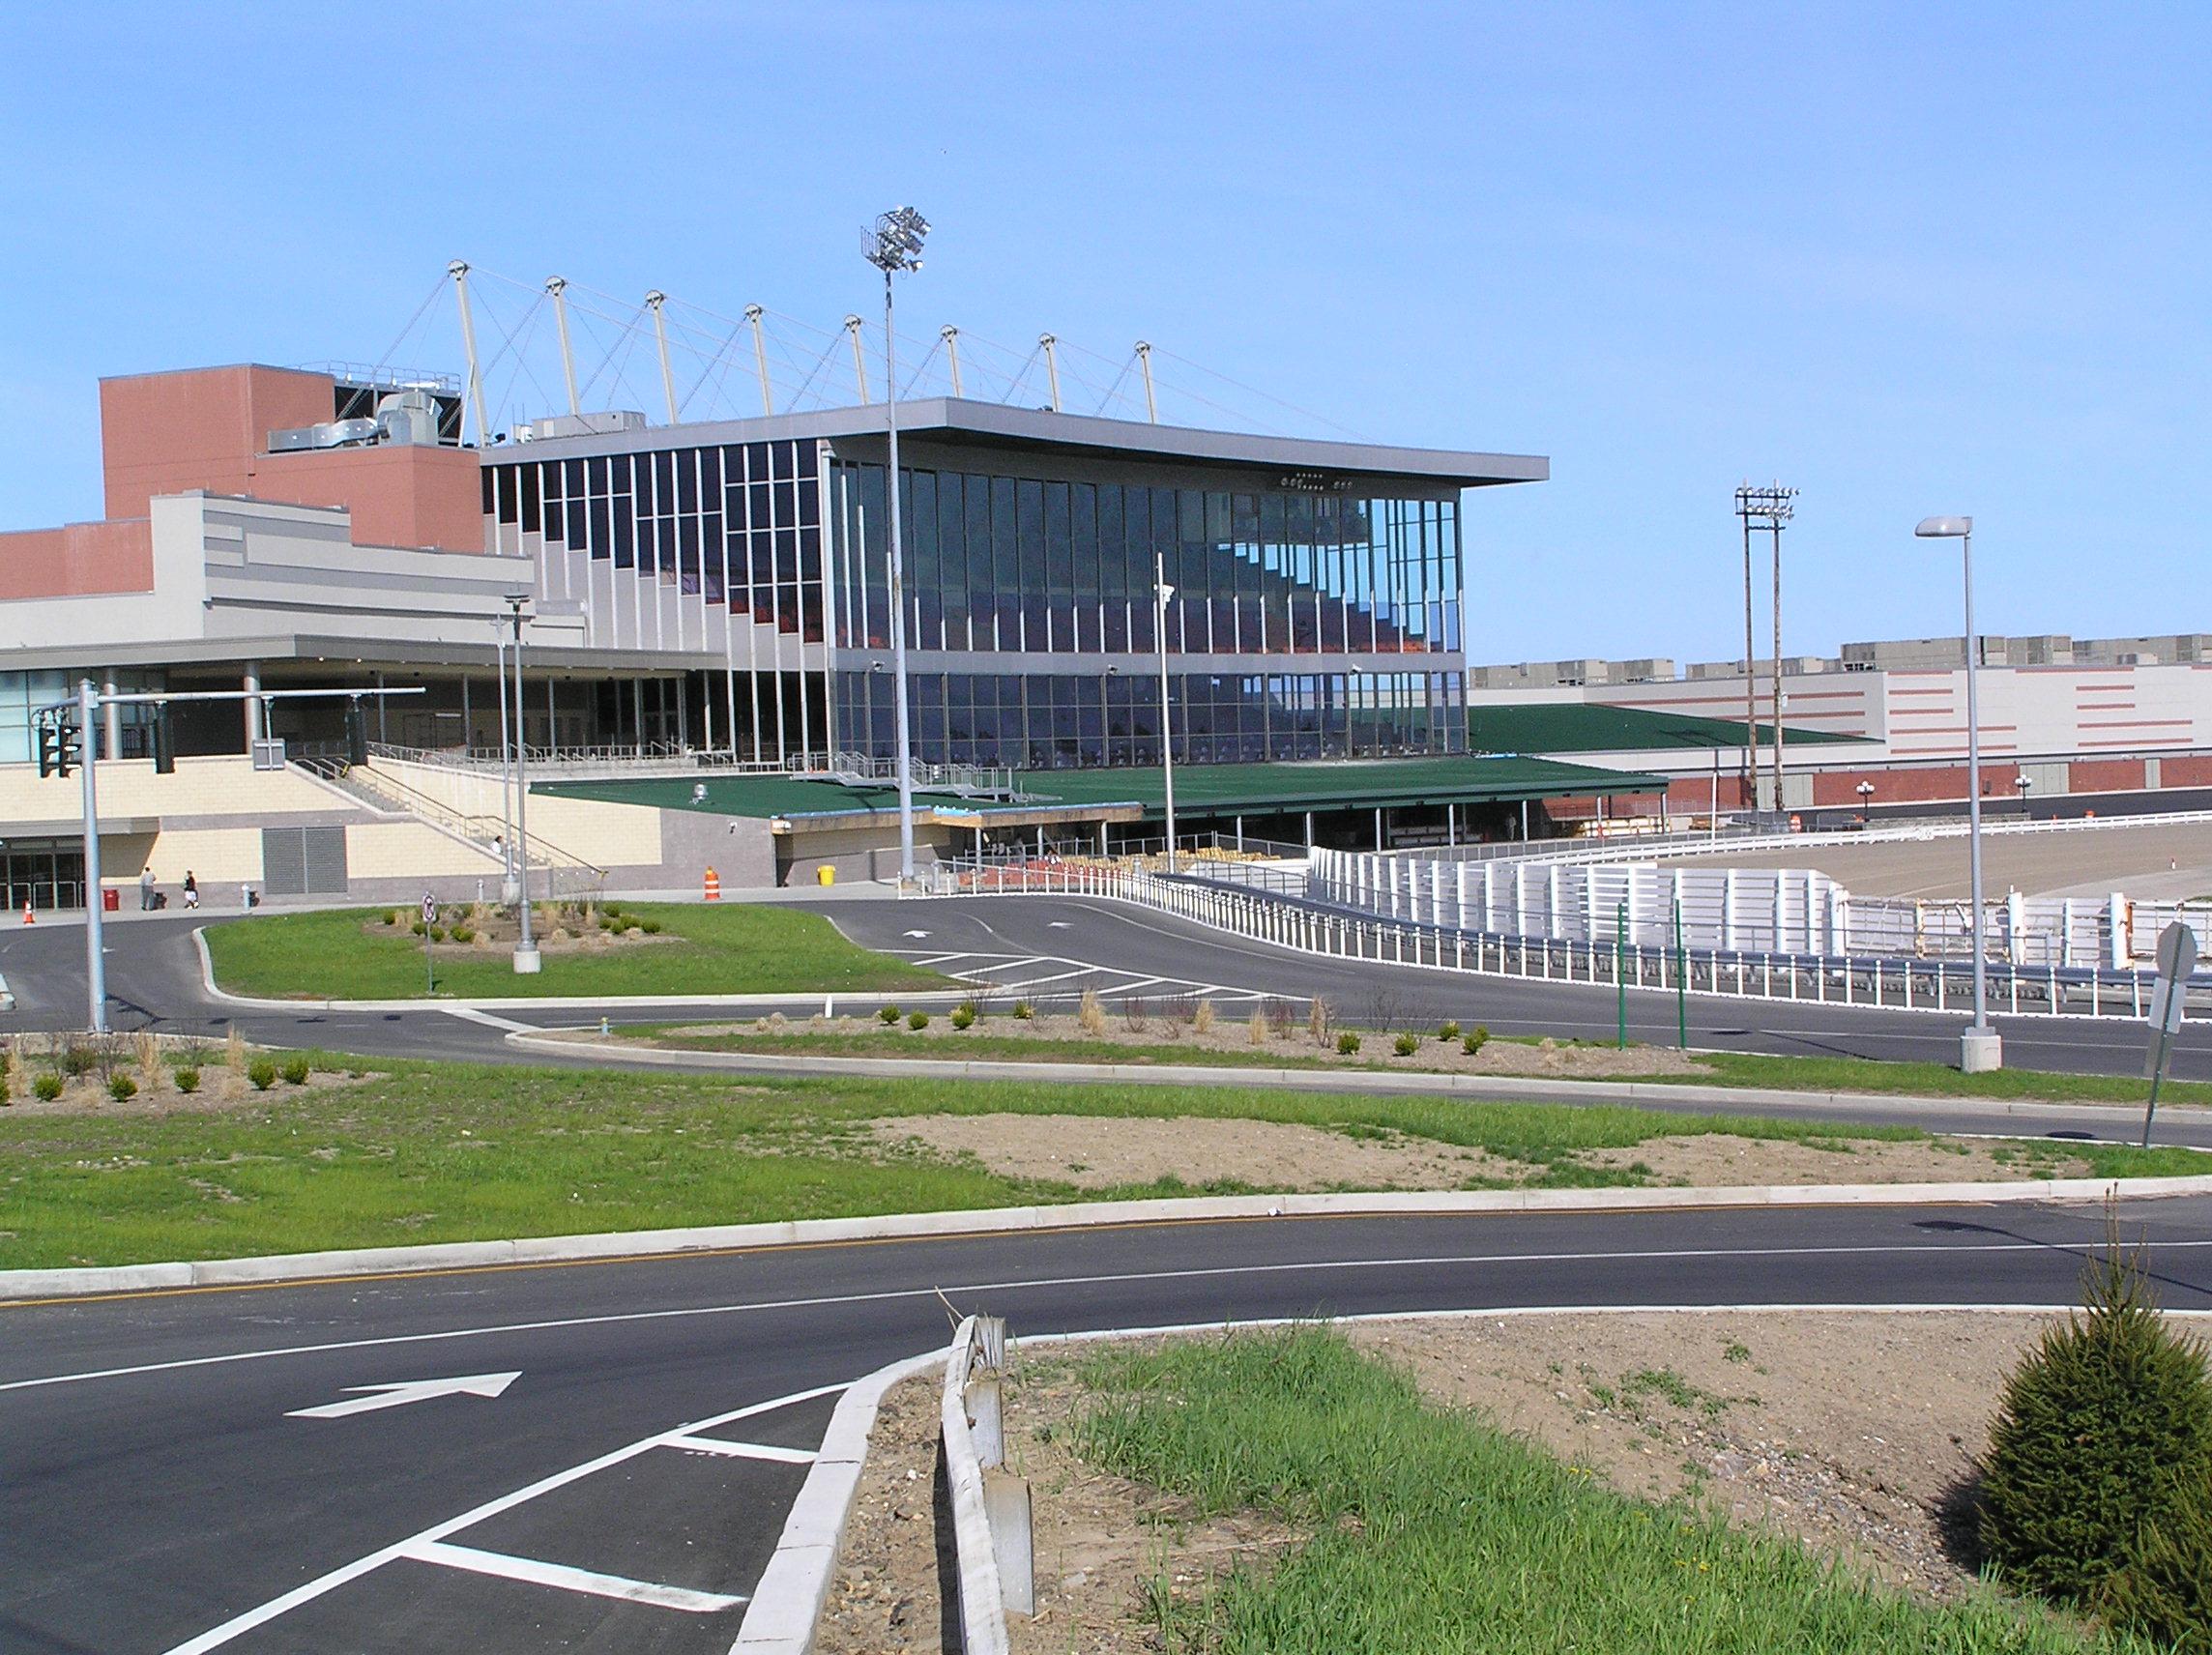 Yonkers raceway casino news tropicana resorts and casino